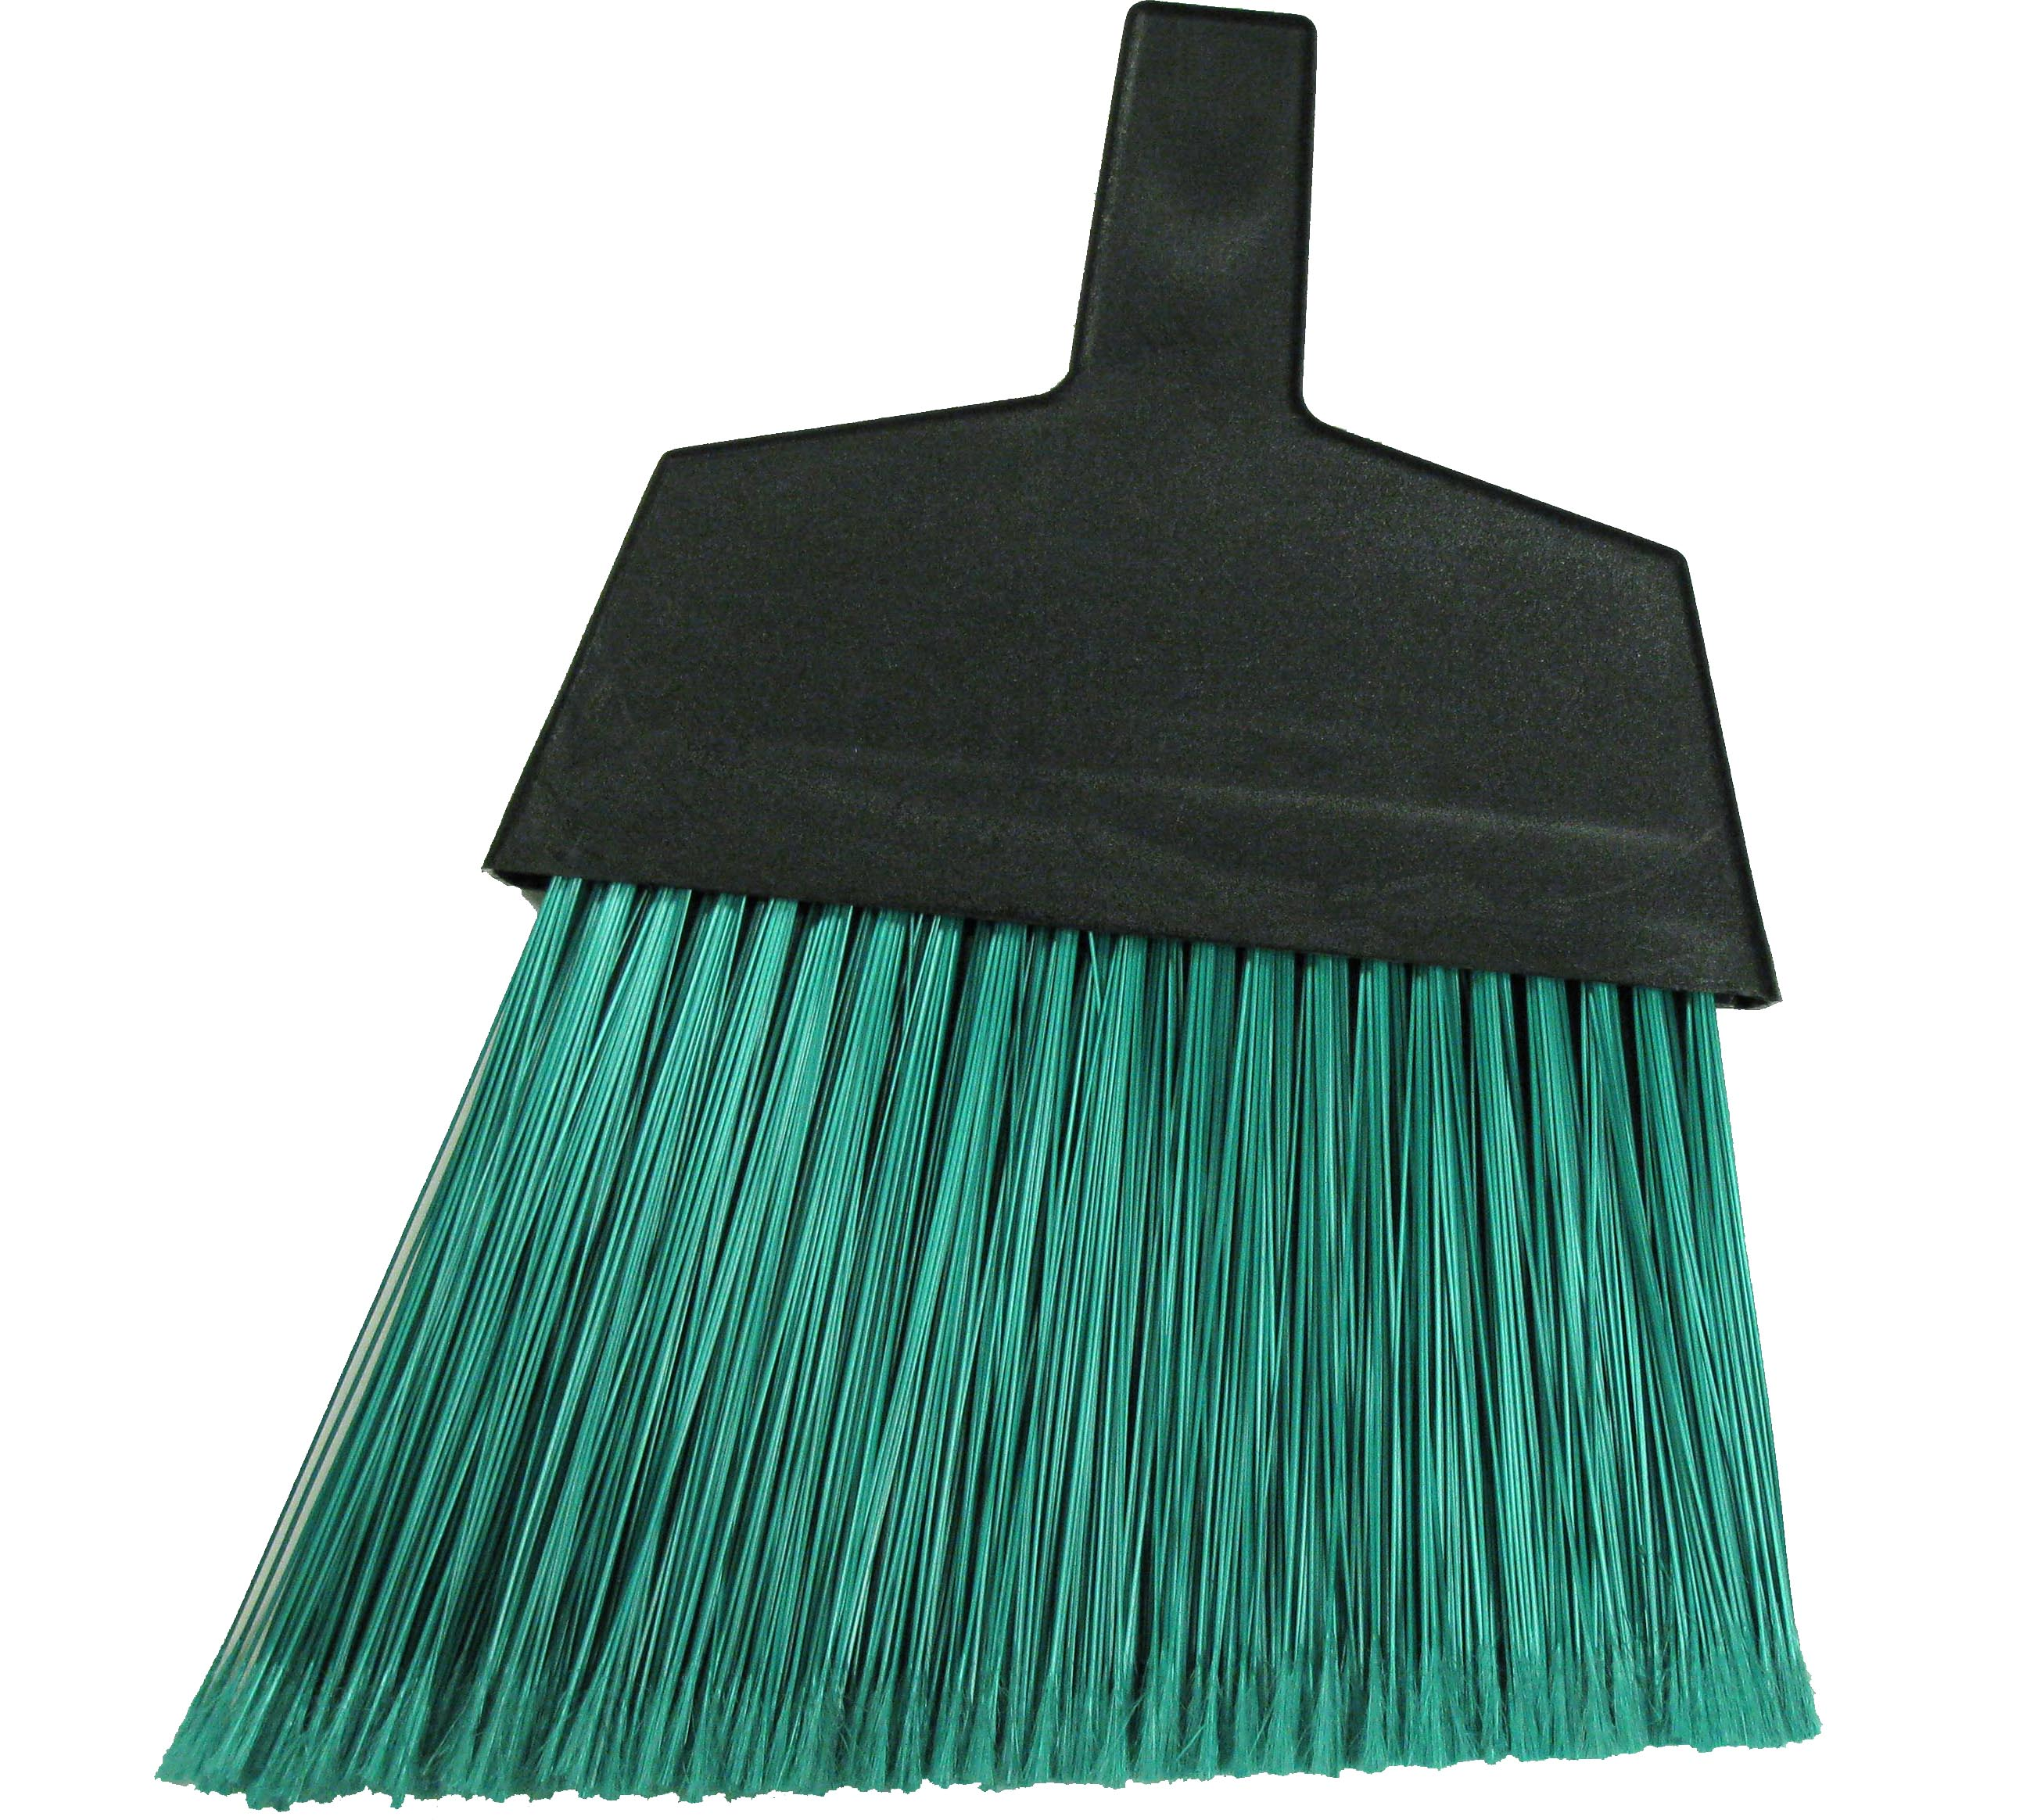 Angle Brooms | Magnolia Brush